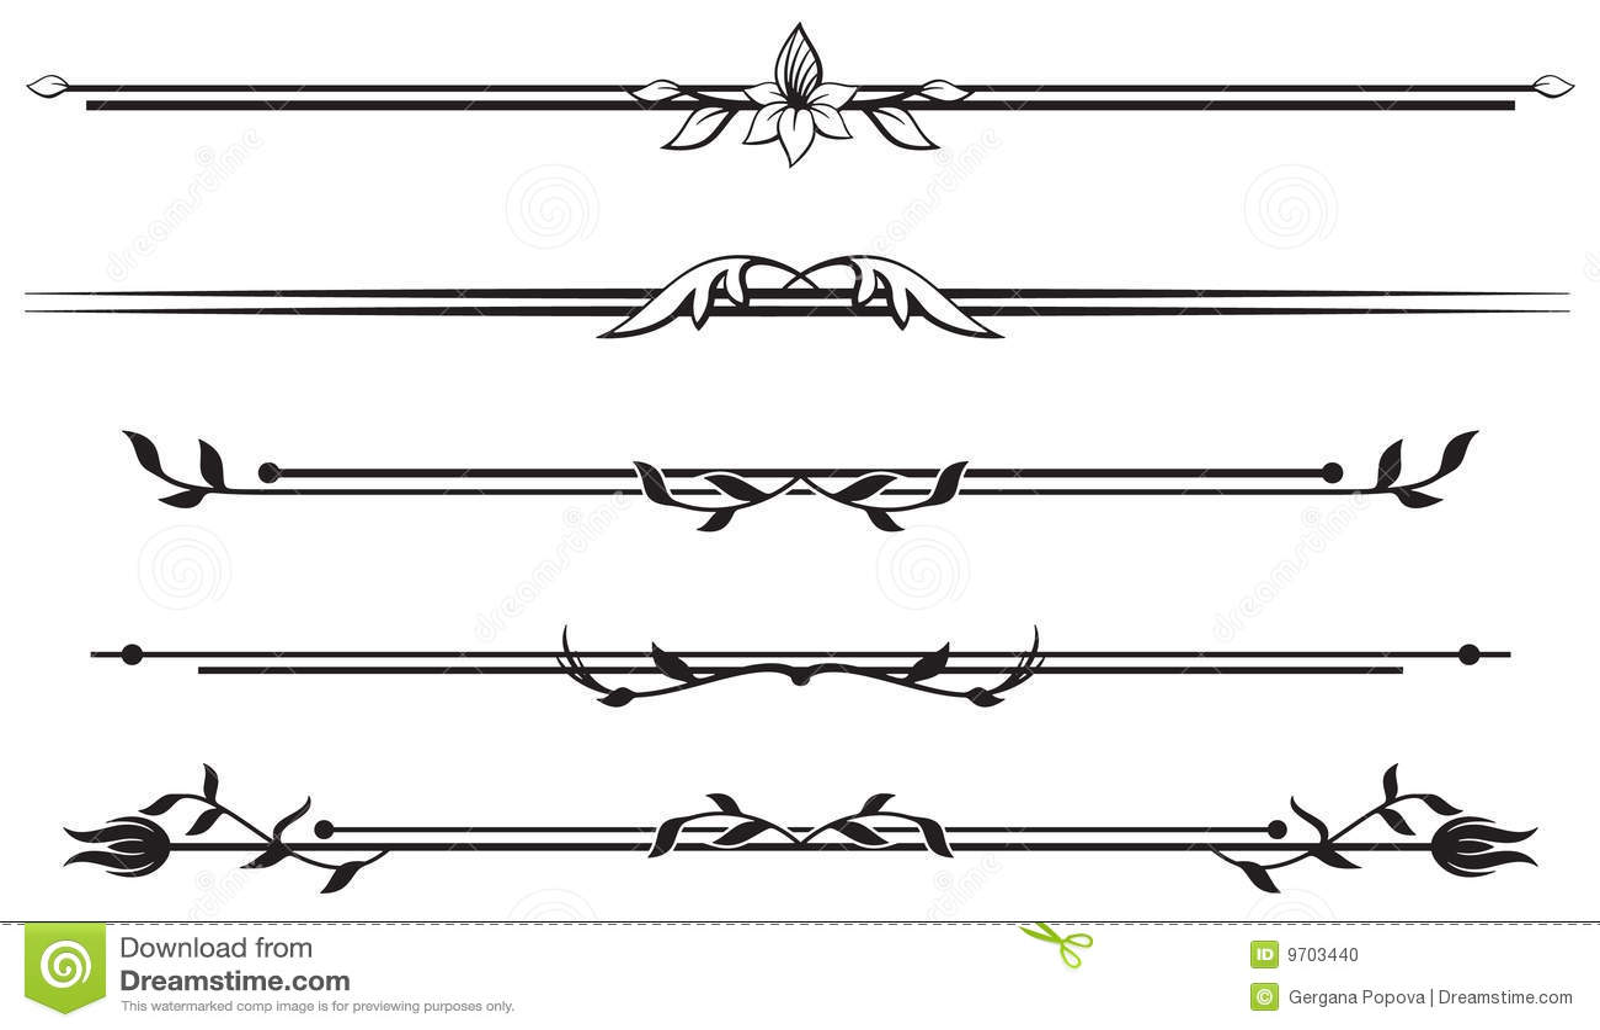 ... Line Clip Art , Decorative Line Clip Art , Straight Line Clip Art